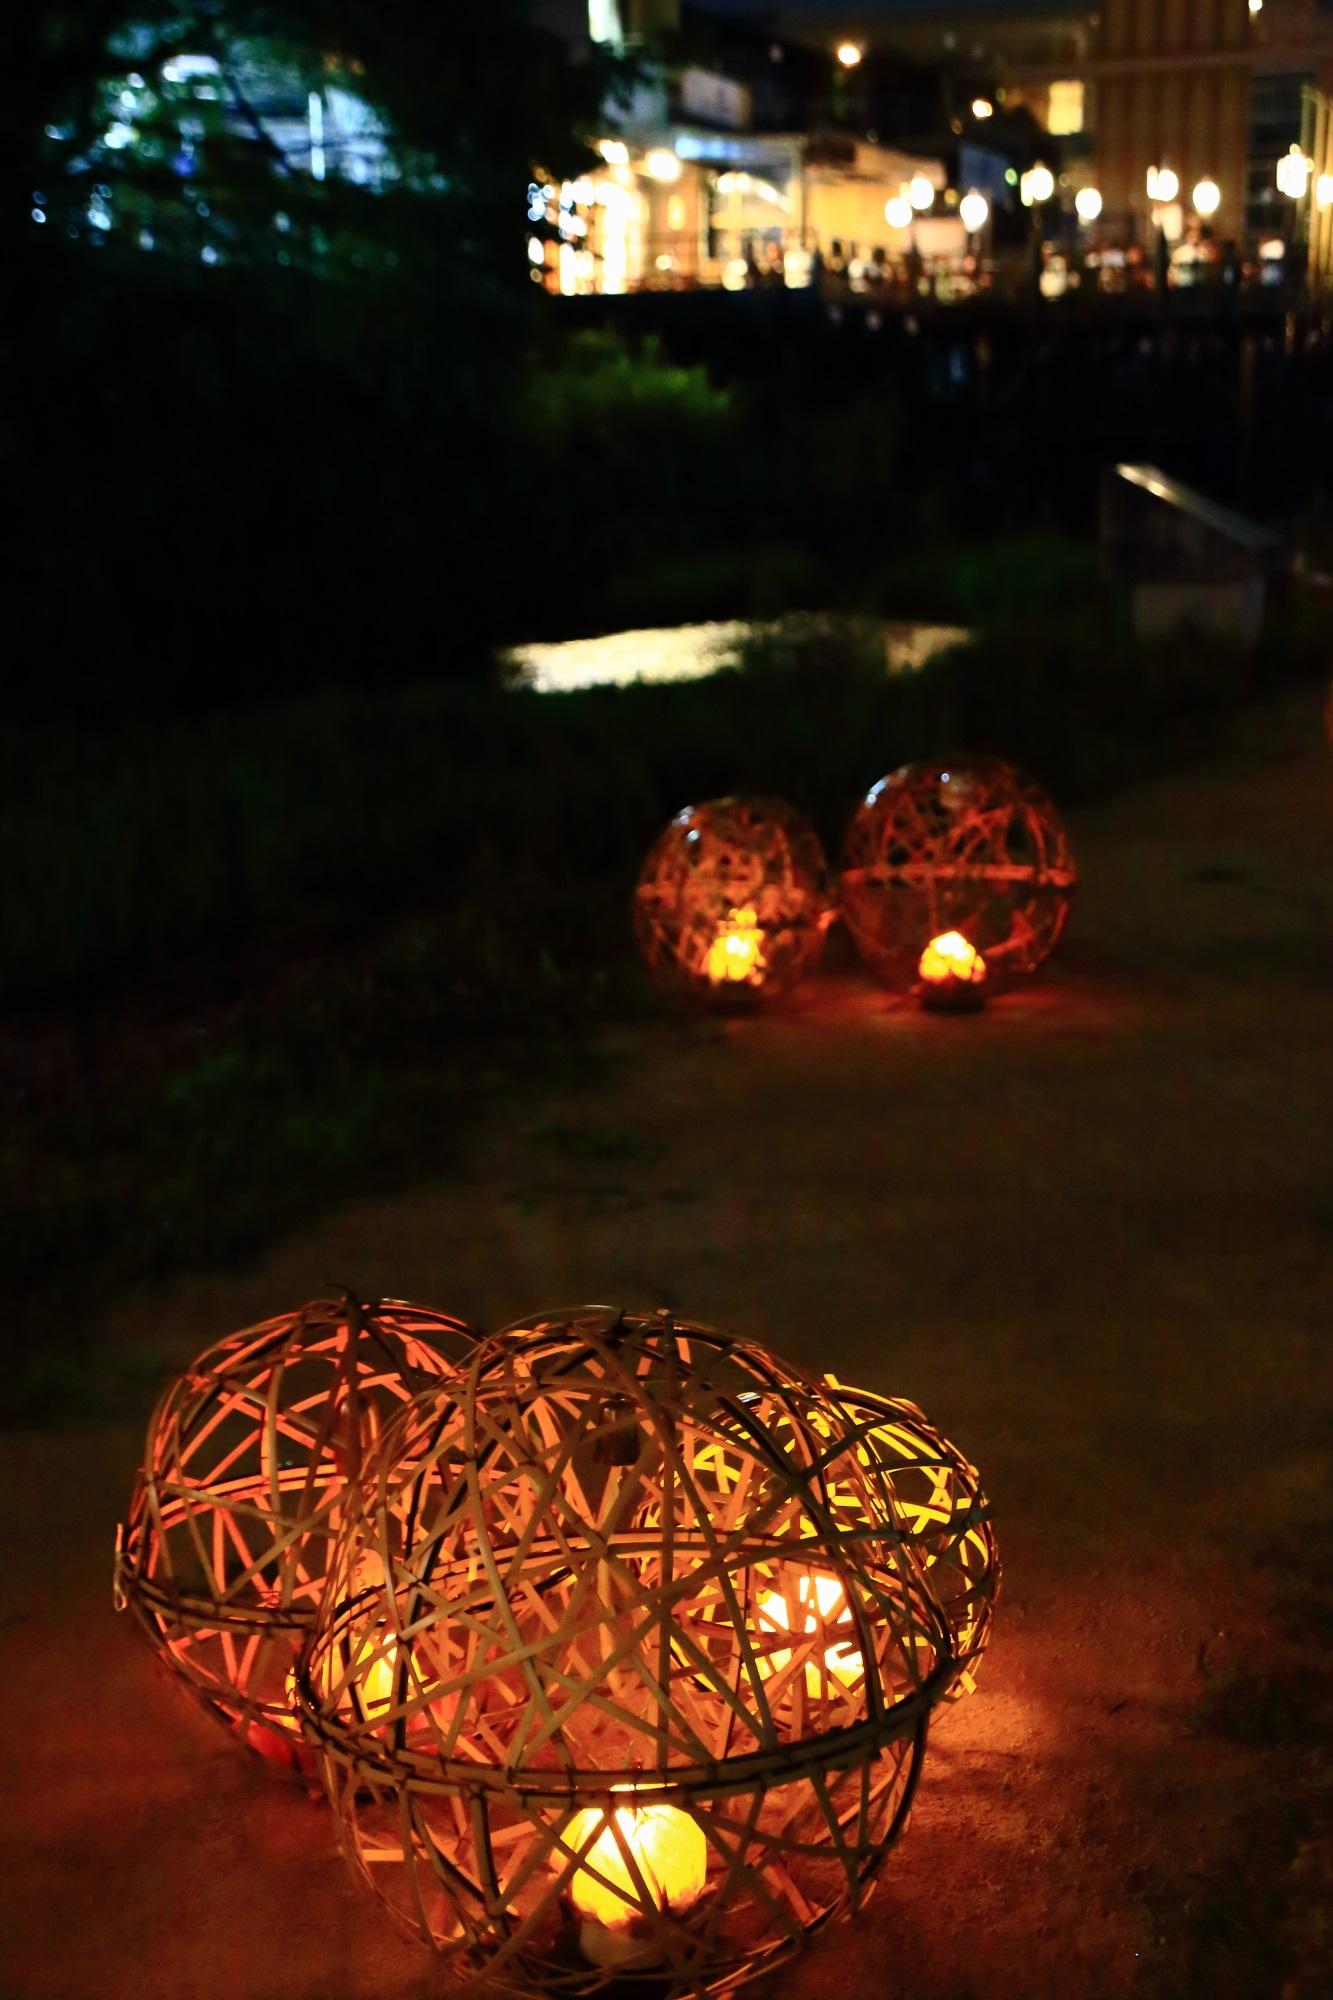 Kyo-no-Tanabata Kamo-Gawa River 風鈴灯 きょうのたなばた